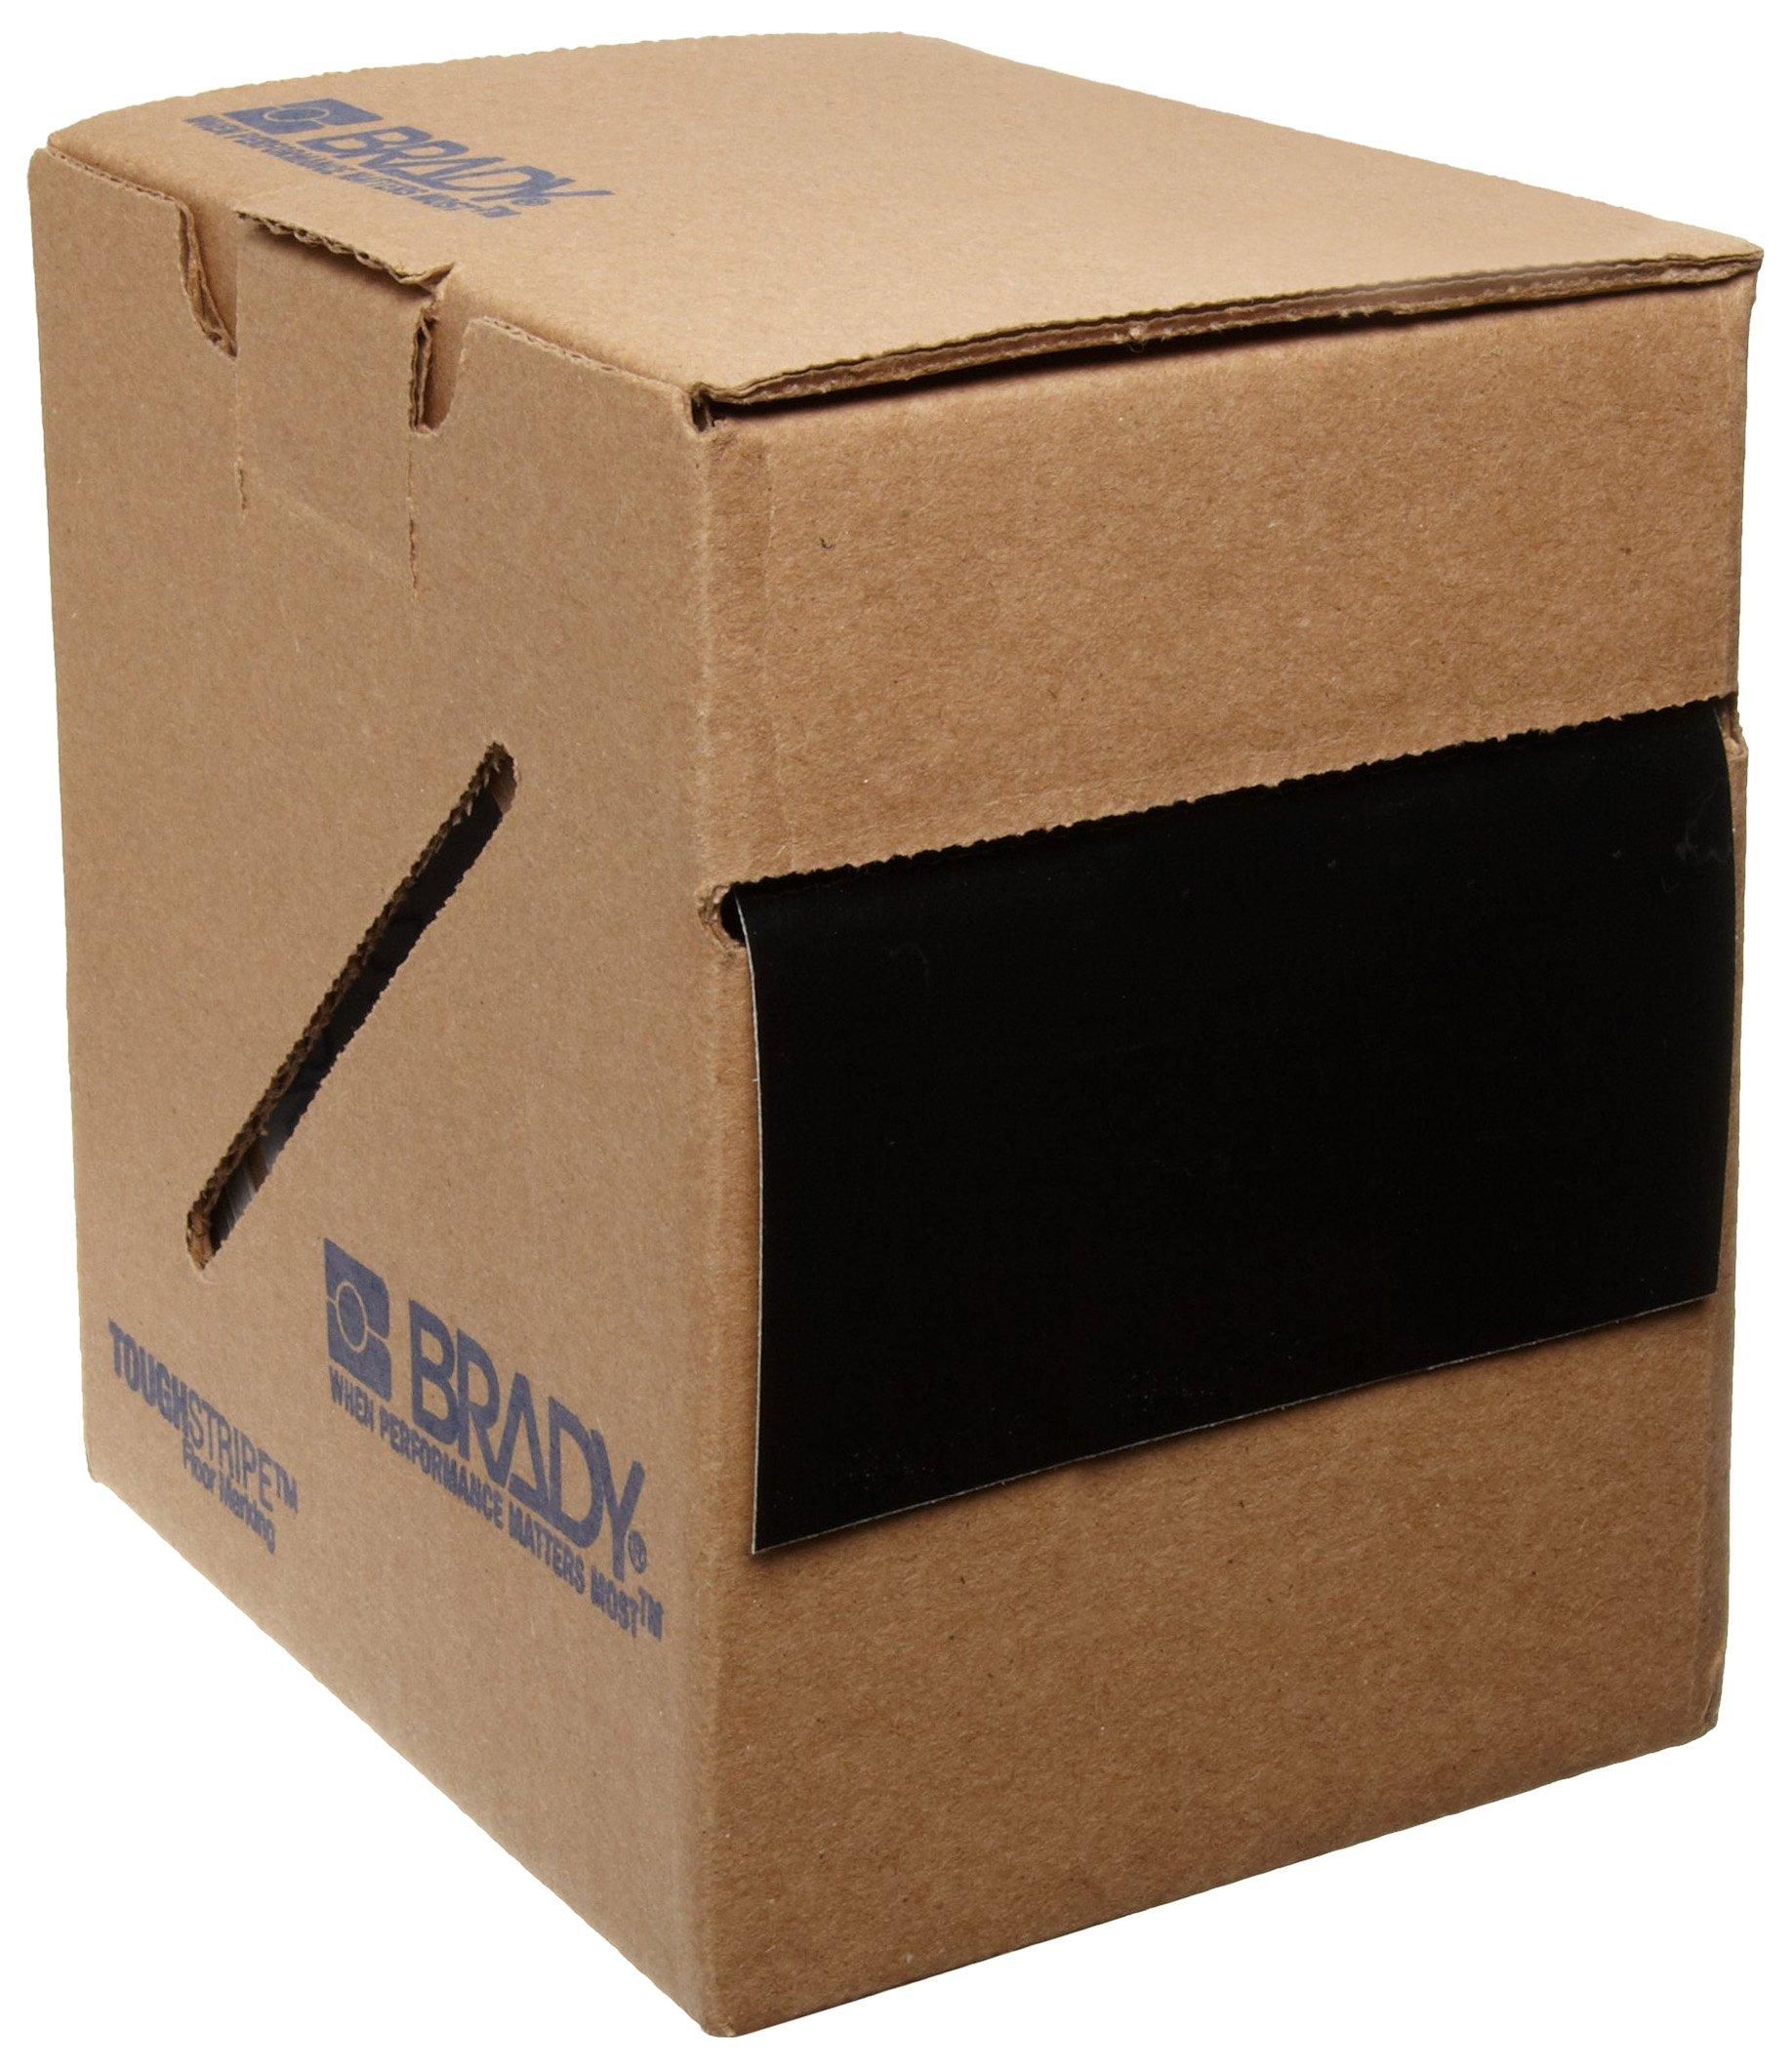 Brady ToughStripe Nonabrasive Floor Marking Tape, 100' Length, 4'' Width, Black (Pack of 1 Roll)